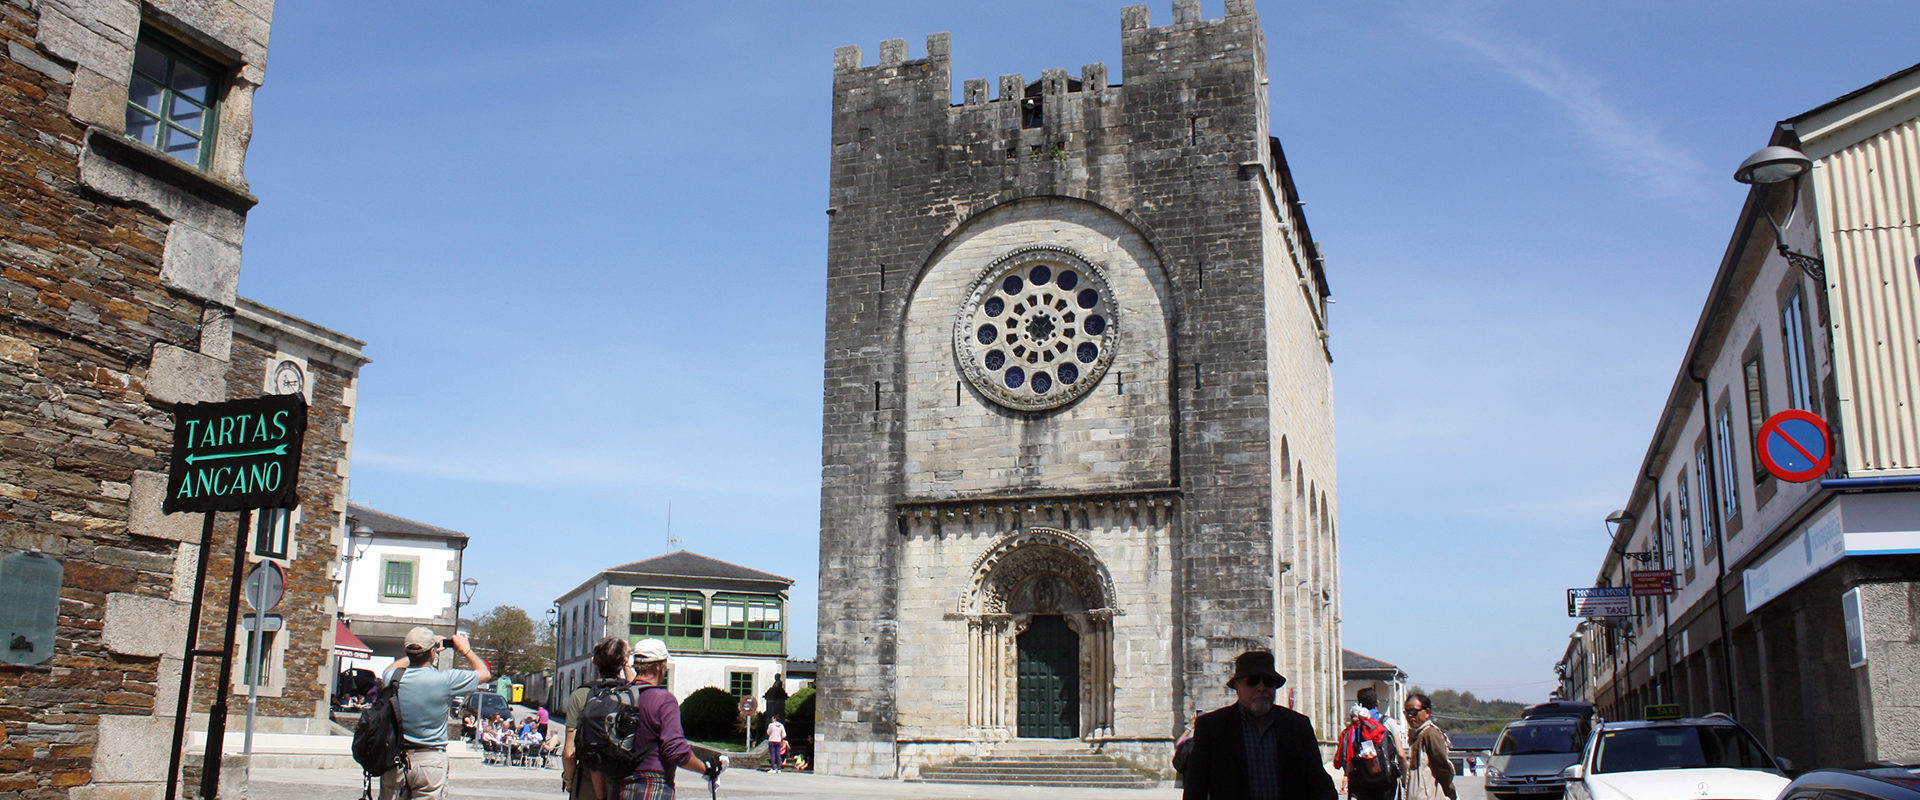 Iglesia de San Juan y San Nicolás